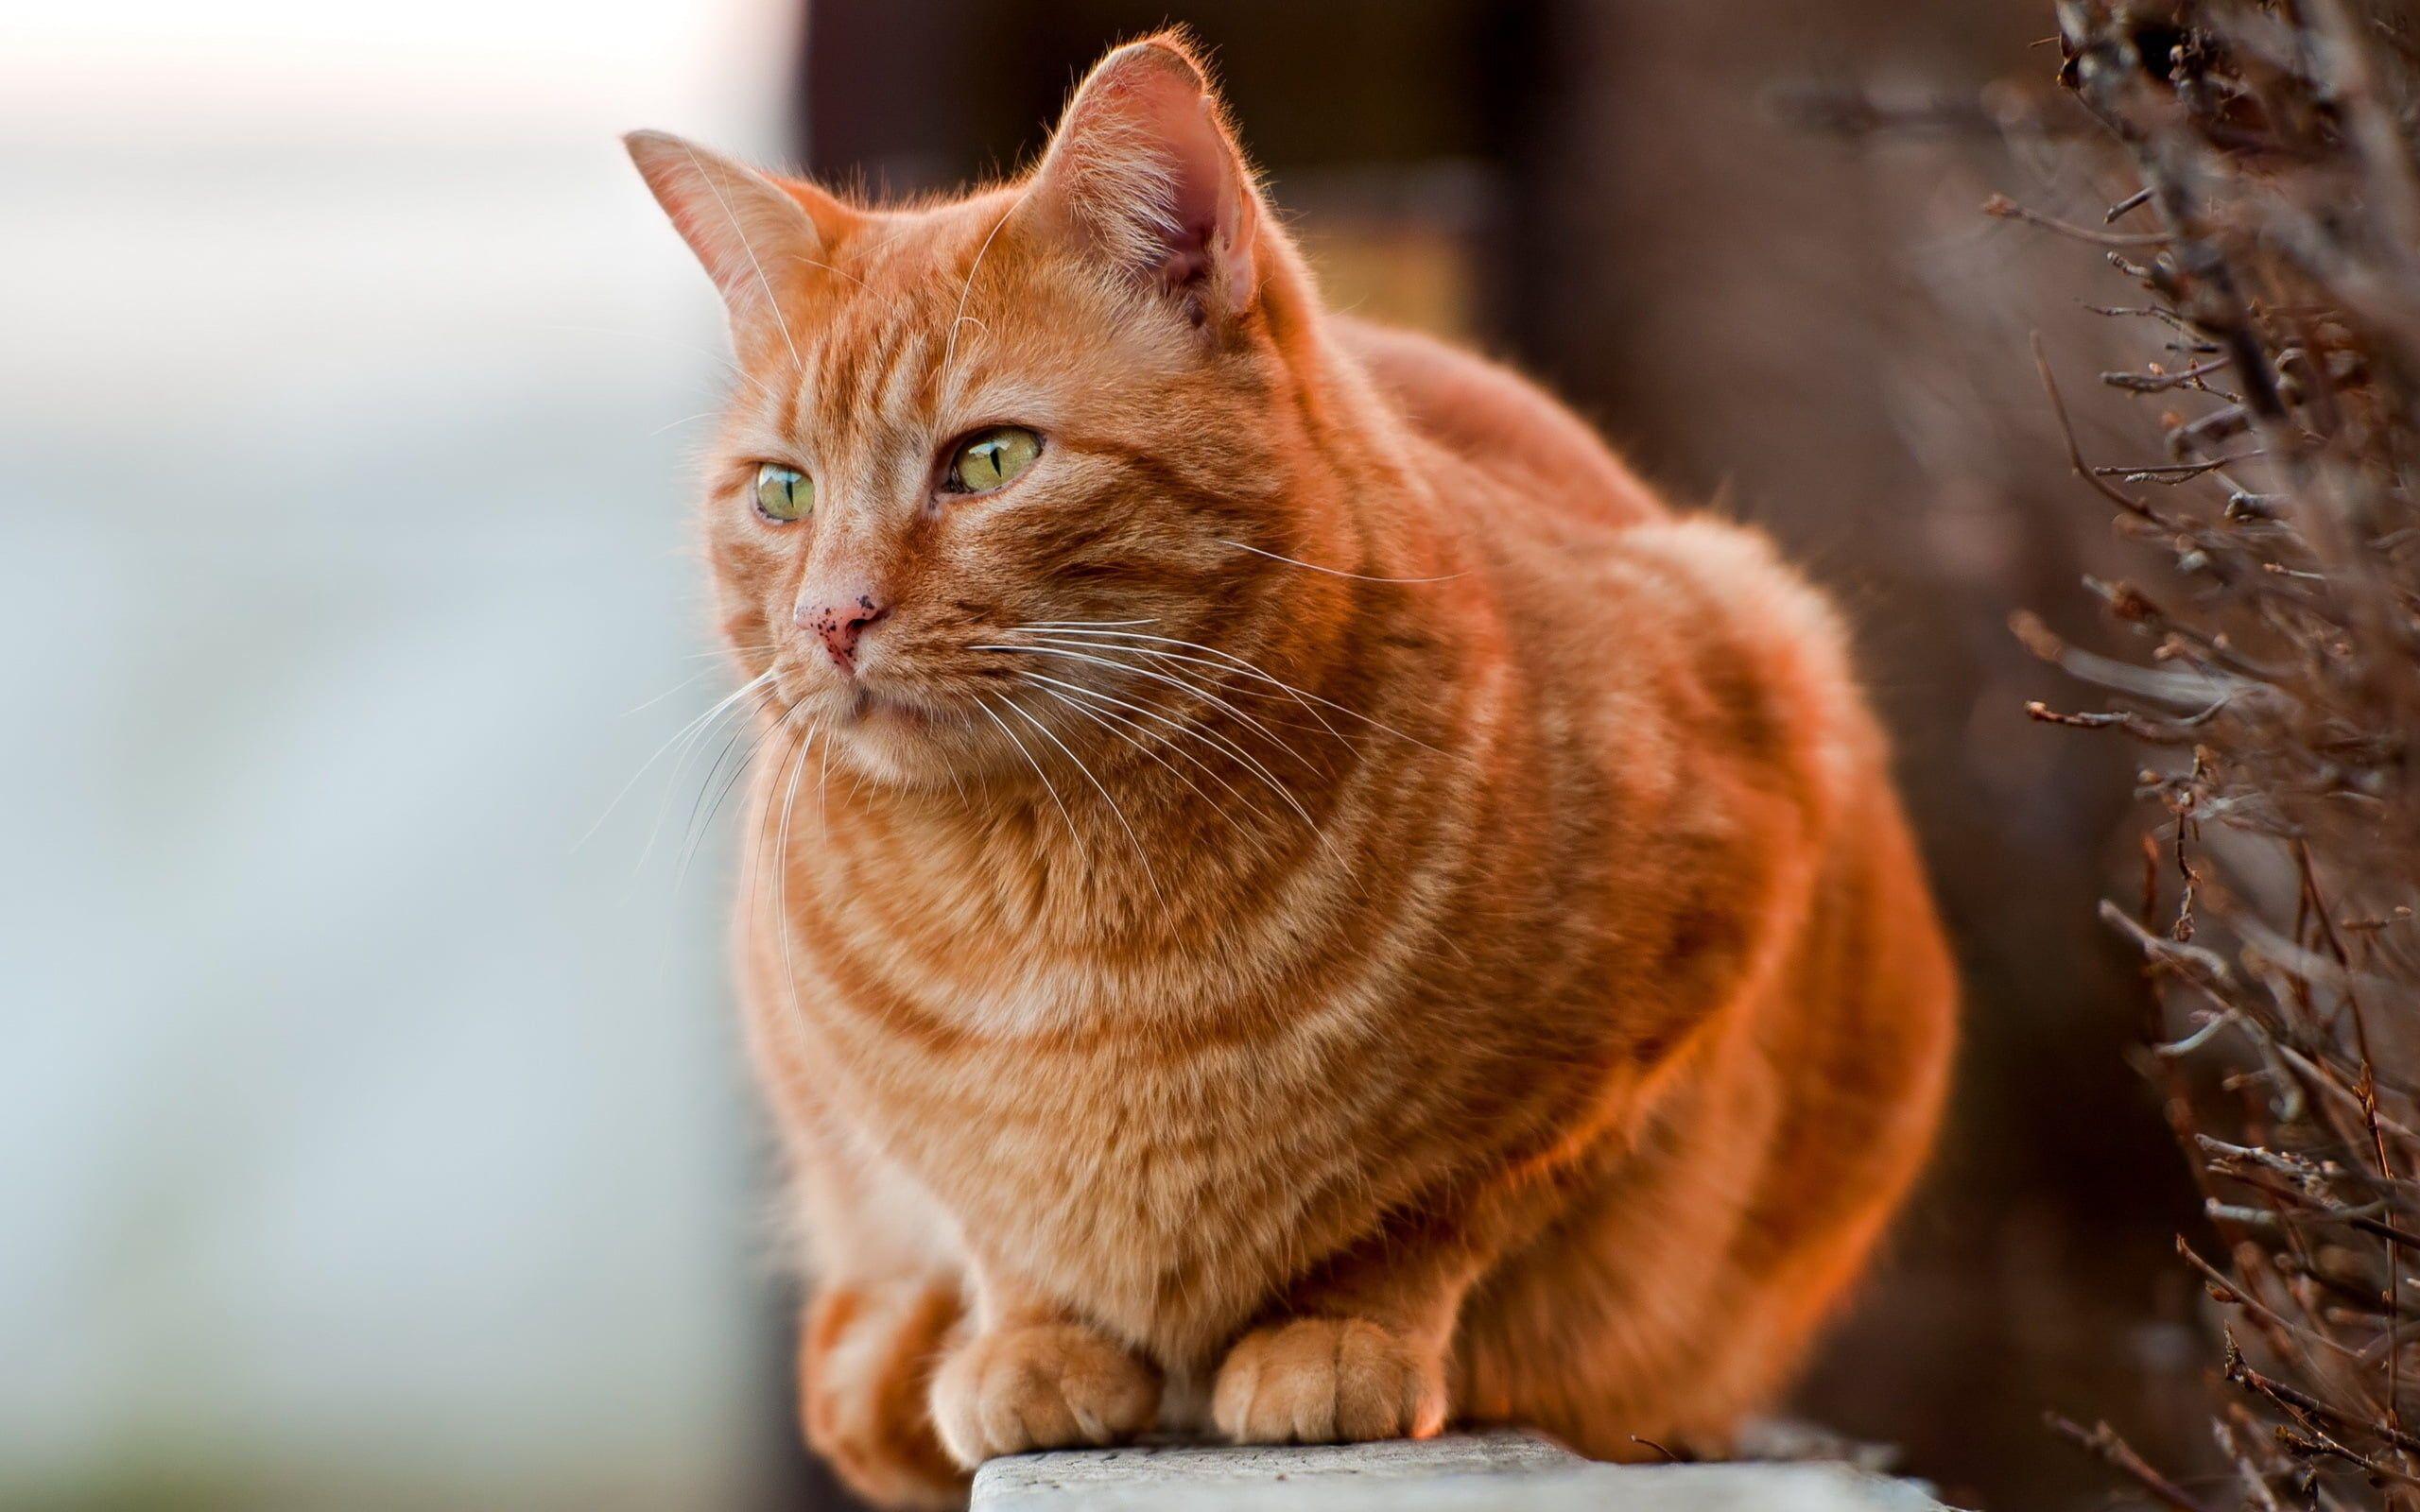 Beth S Son Has An Orange Tabby Cat Like This Orange Cats Orange Tabby Cats Fluffy Cat Breeds